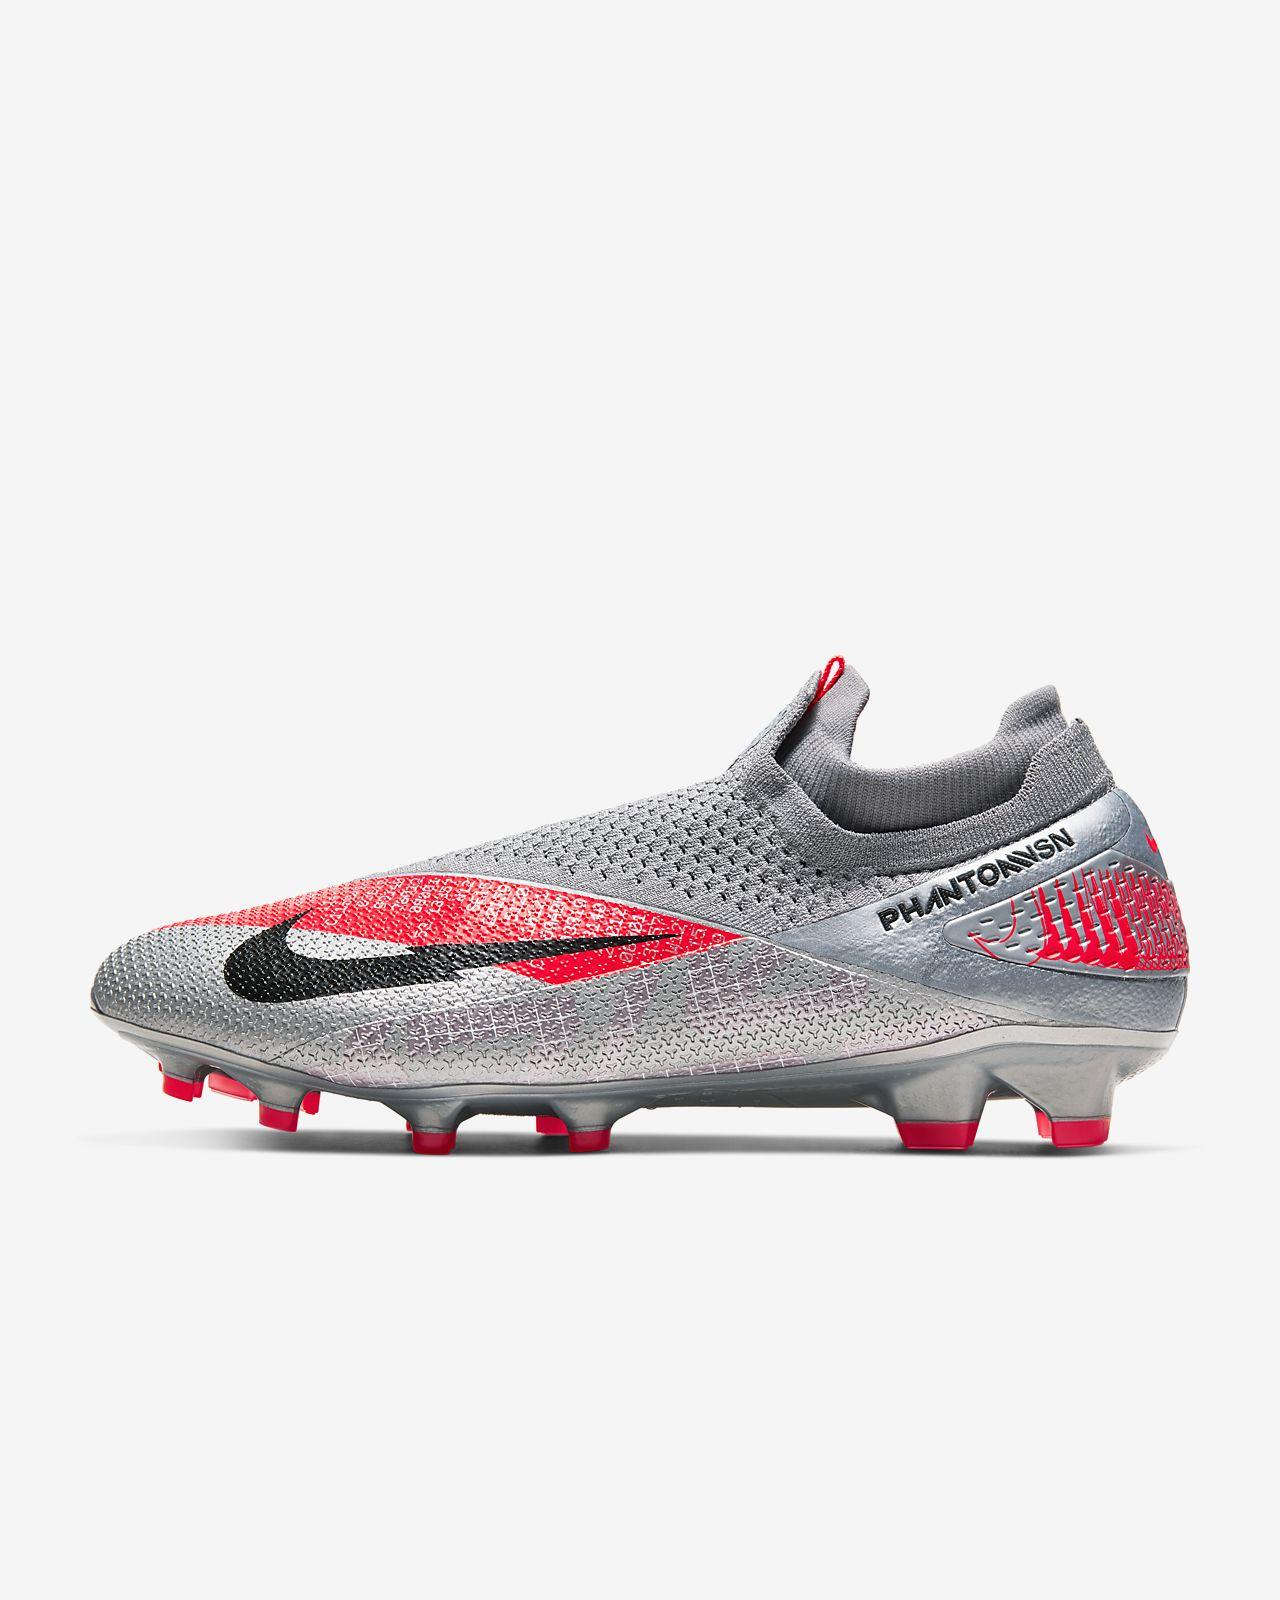 Футбольные бутсы для игры на твердом грунте Nike Phantom Vision 2 Elite Dynamic Fit FG